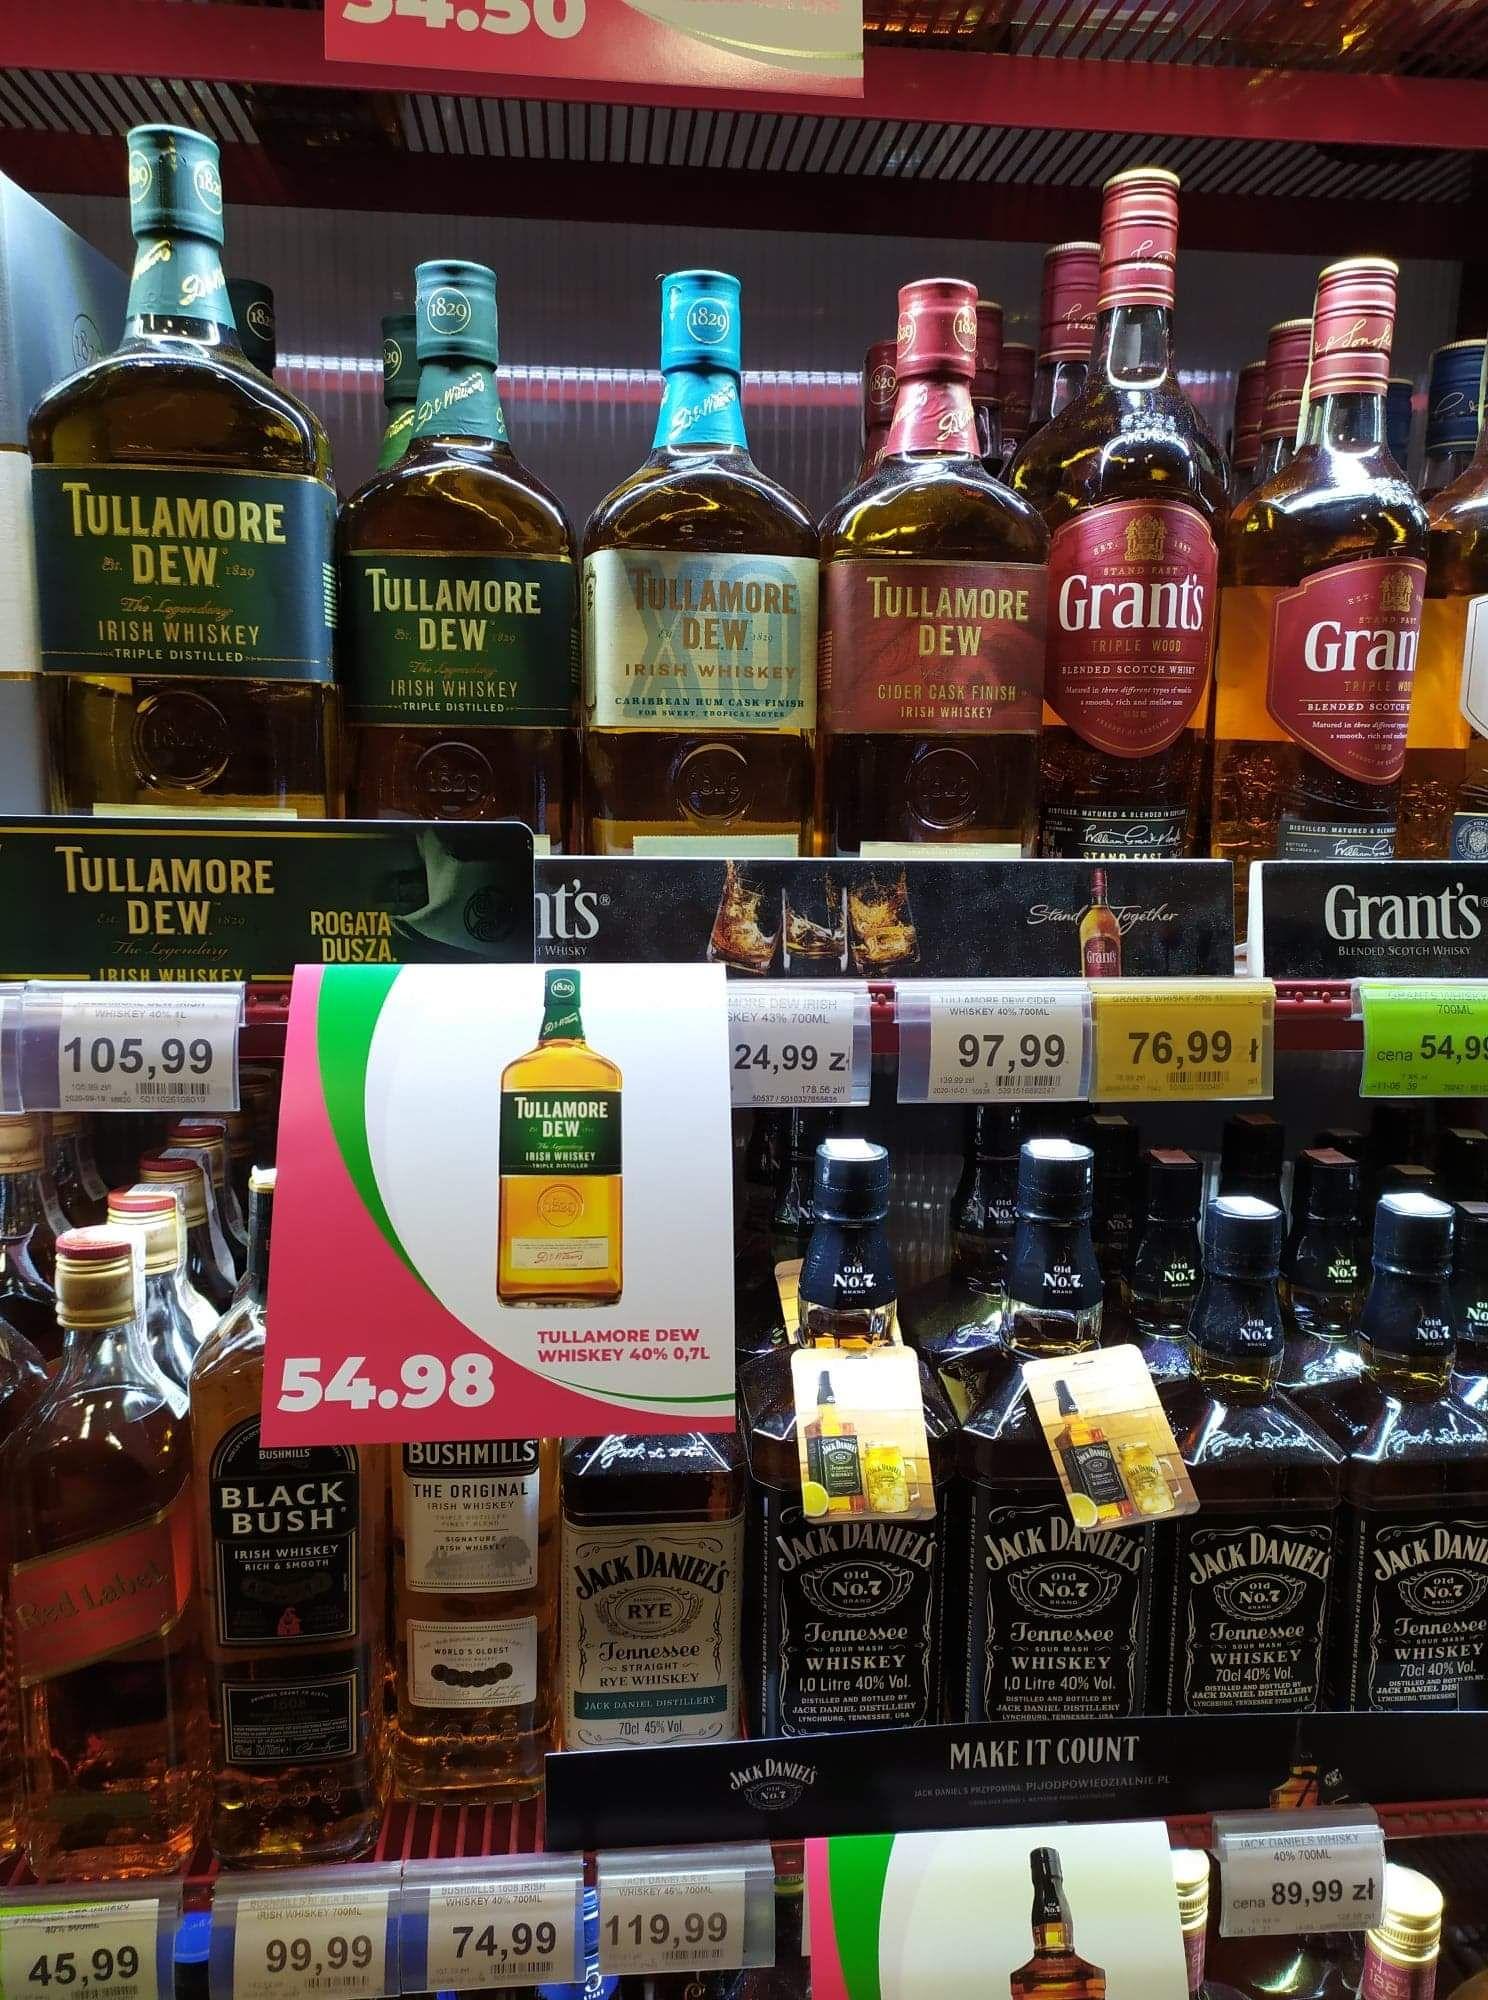 Whisky whiskey TULLAMORE DEW 0,7L 54,98zł Paluszek Toruń